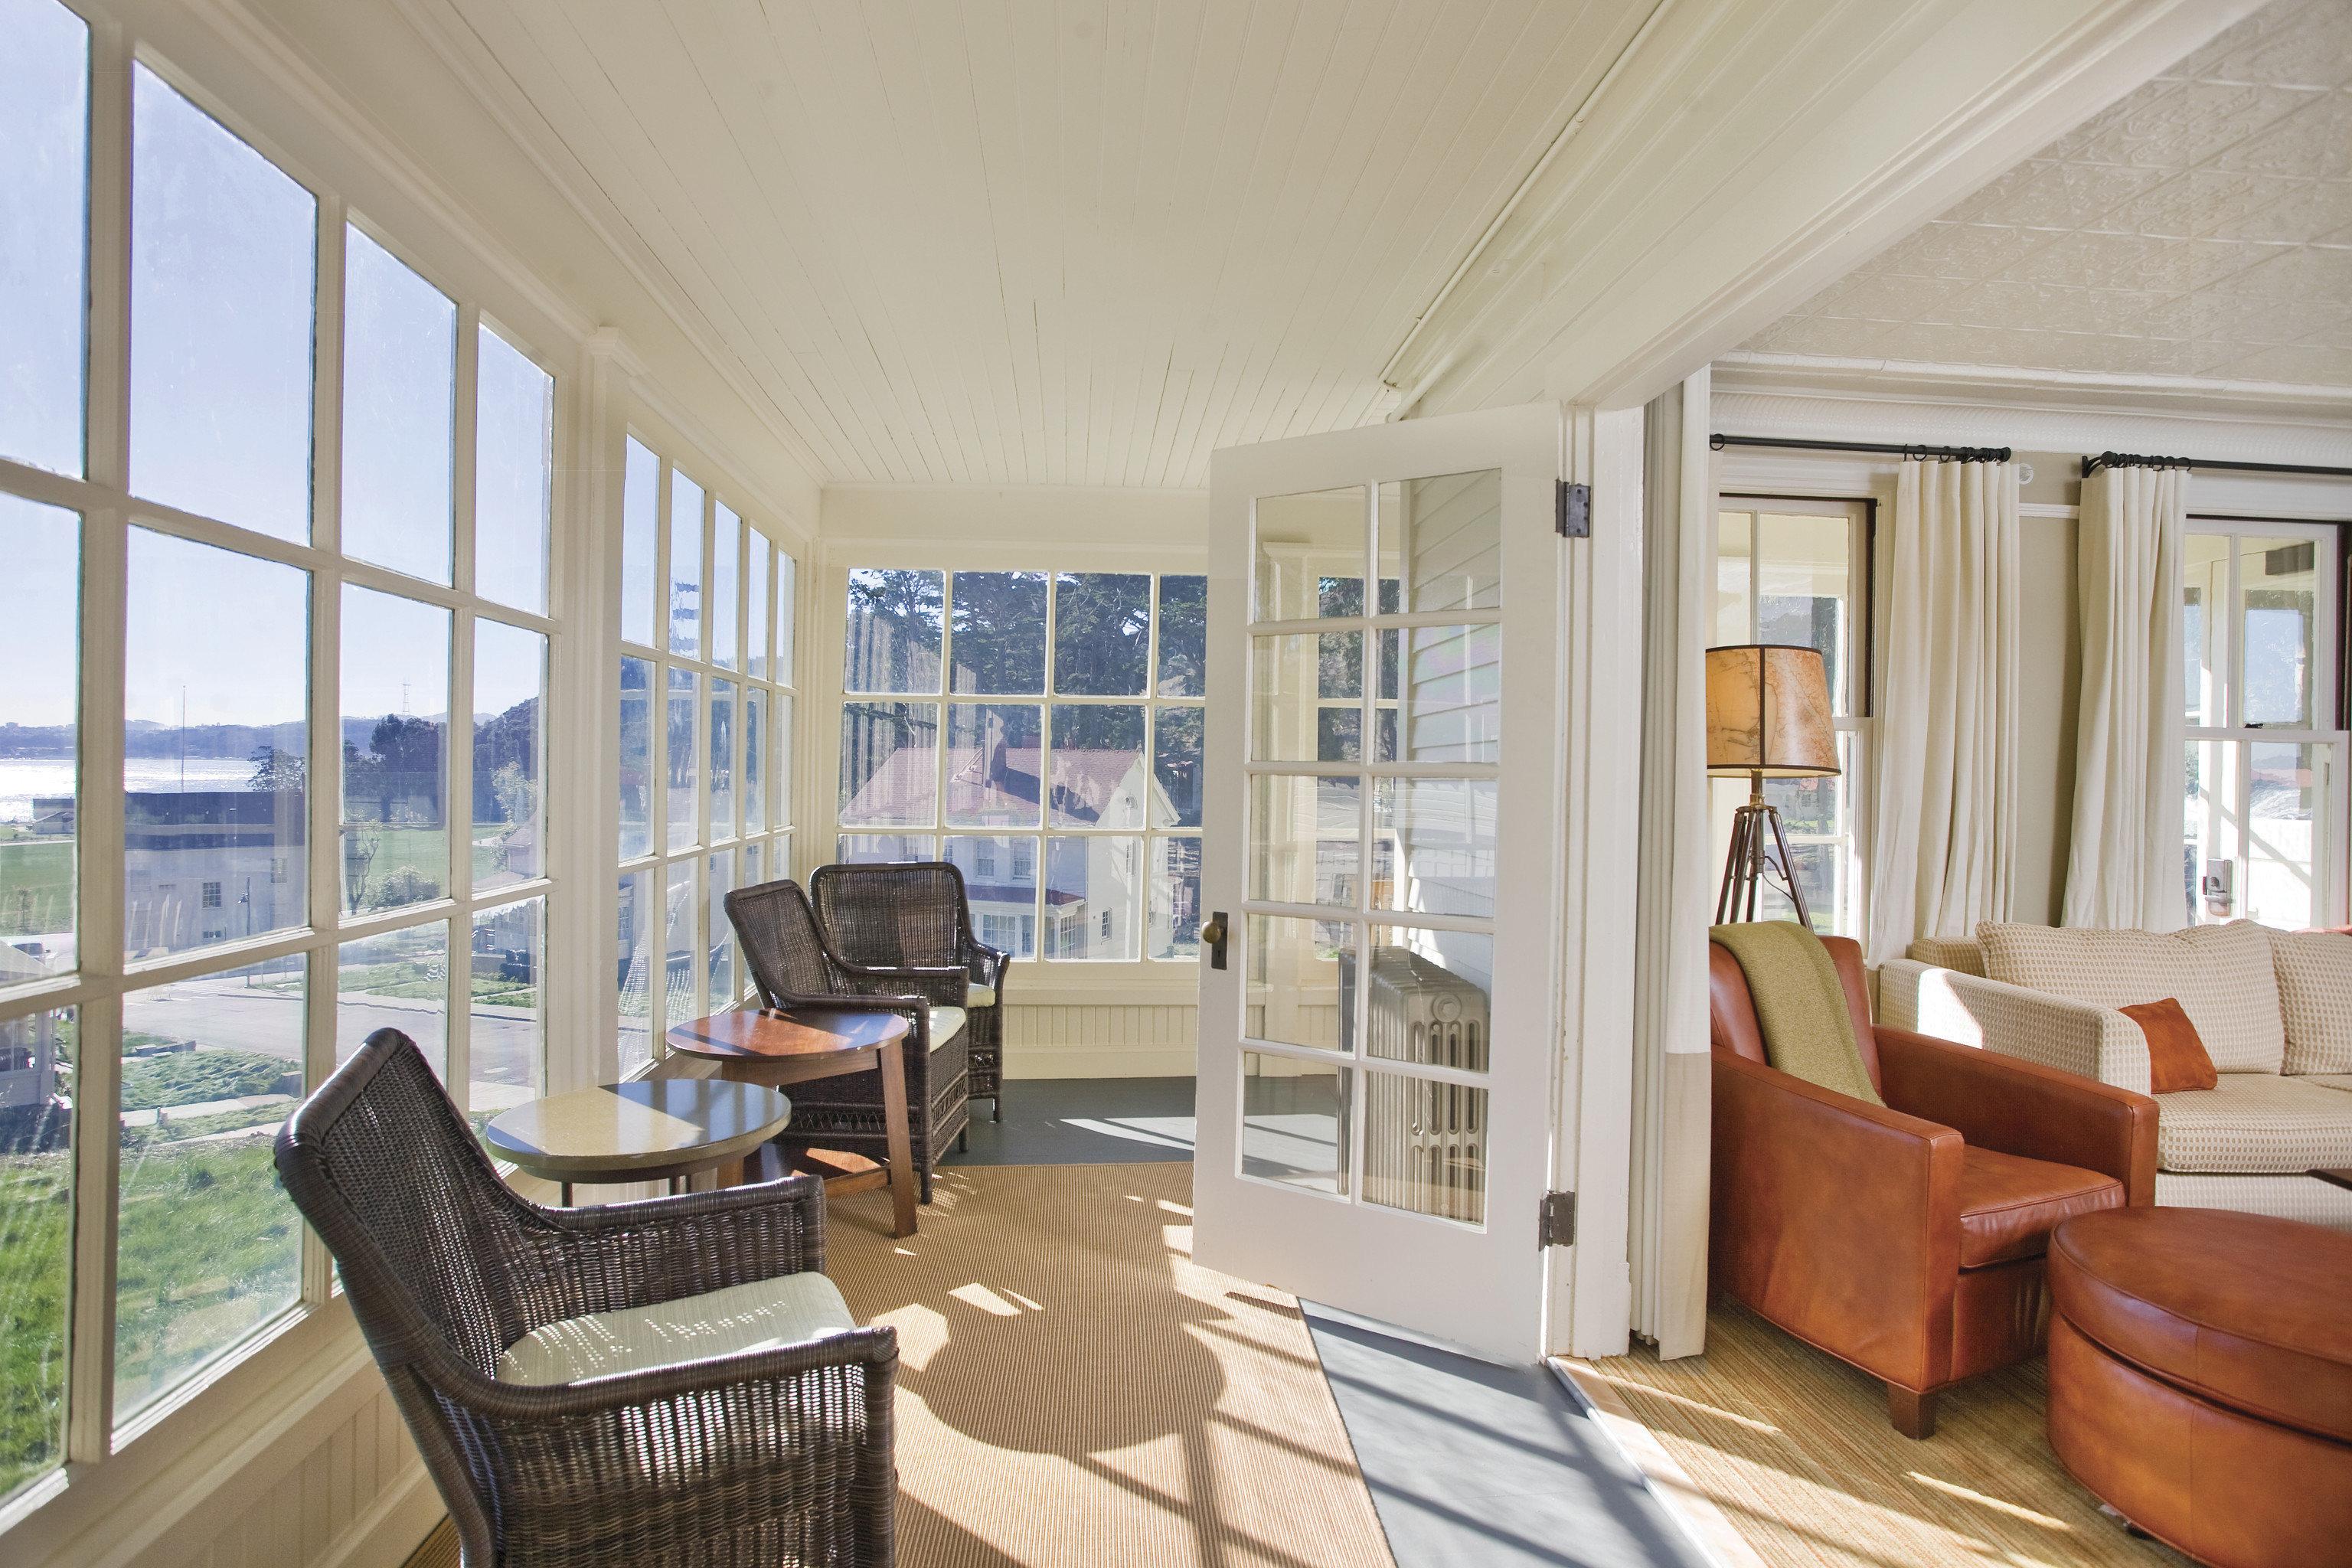 property chair home living room hardwood cottage condominium farmhouse porch